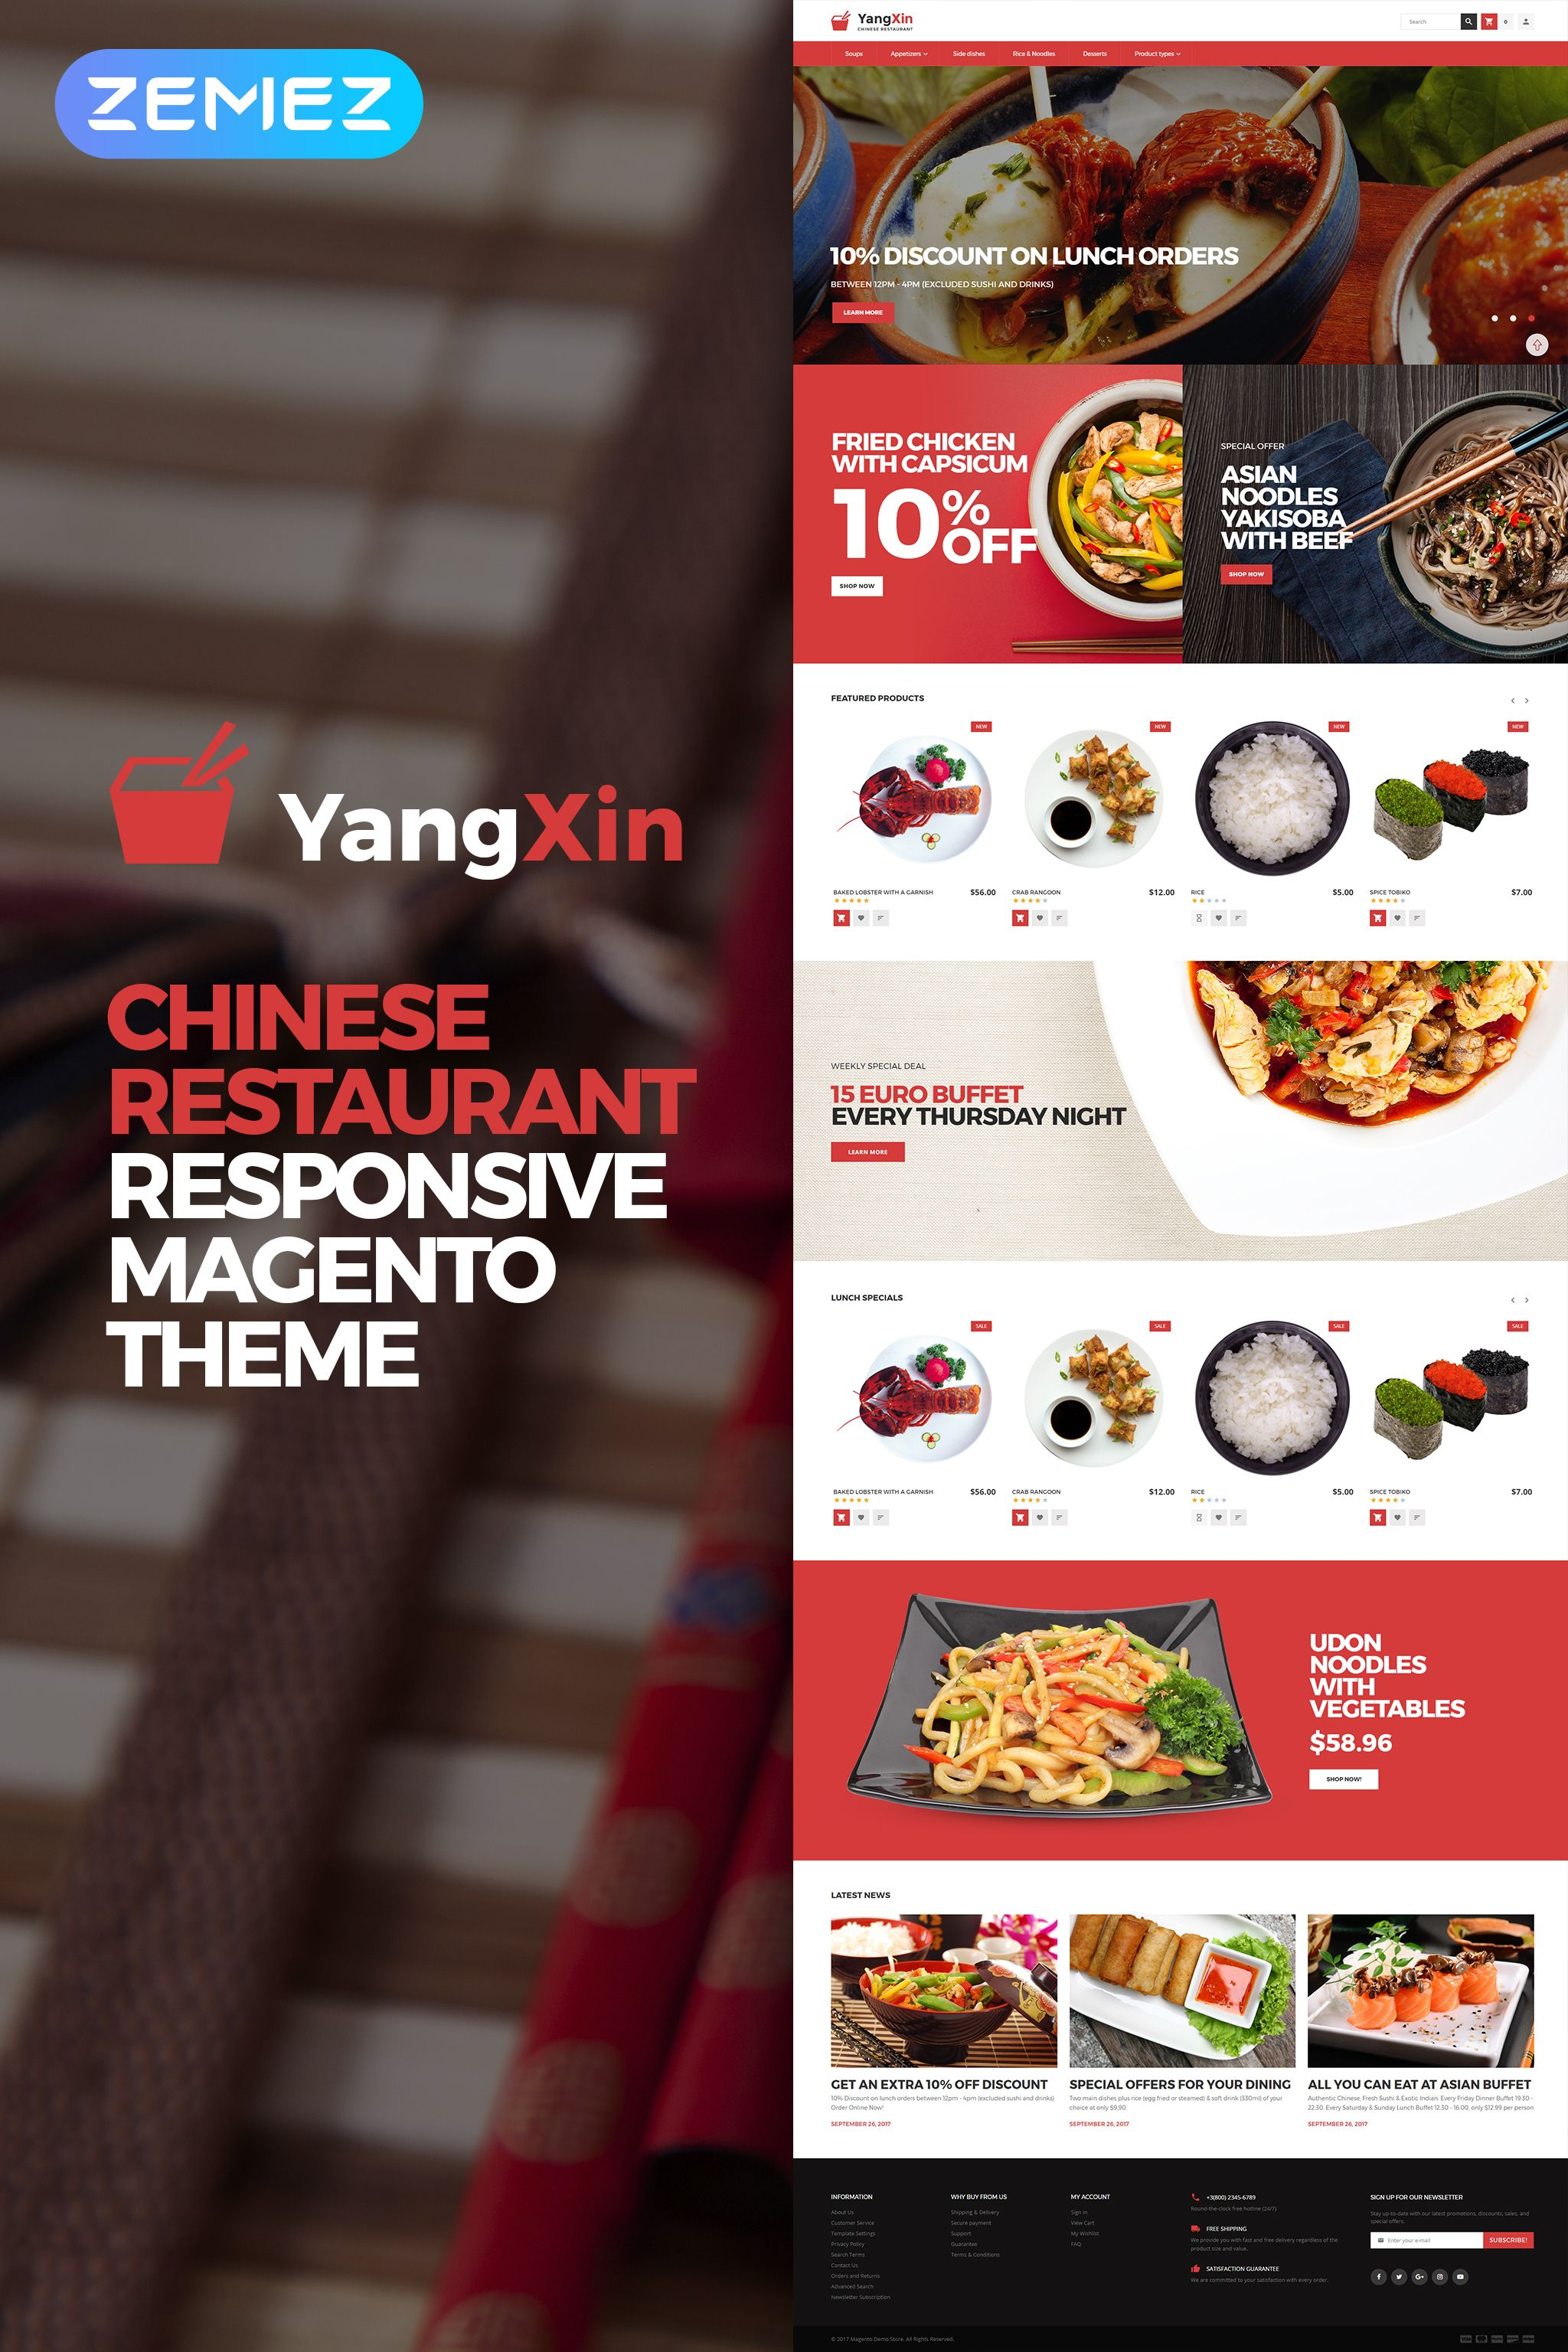 Yangxin Chinese Restaurant Magento Theme Chinese Yangxin Restaurant Magento Magento Themes Chinese Restaurant Food Web Design